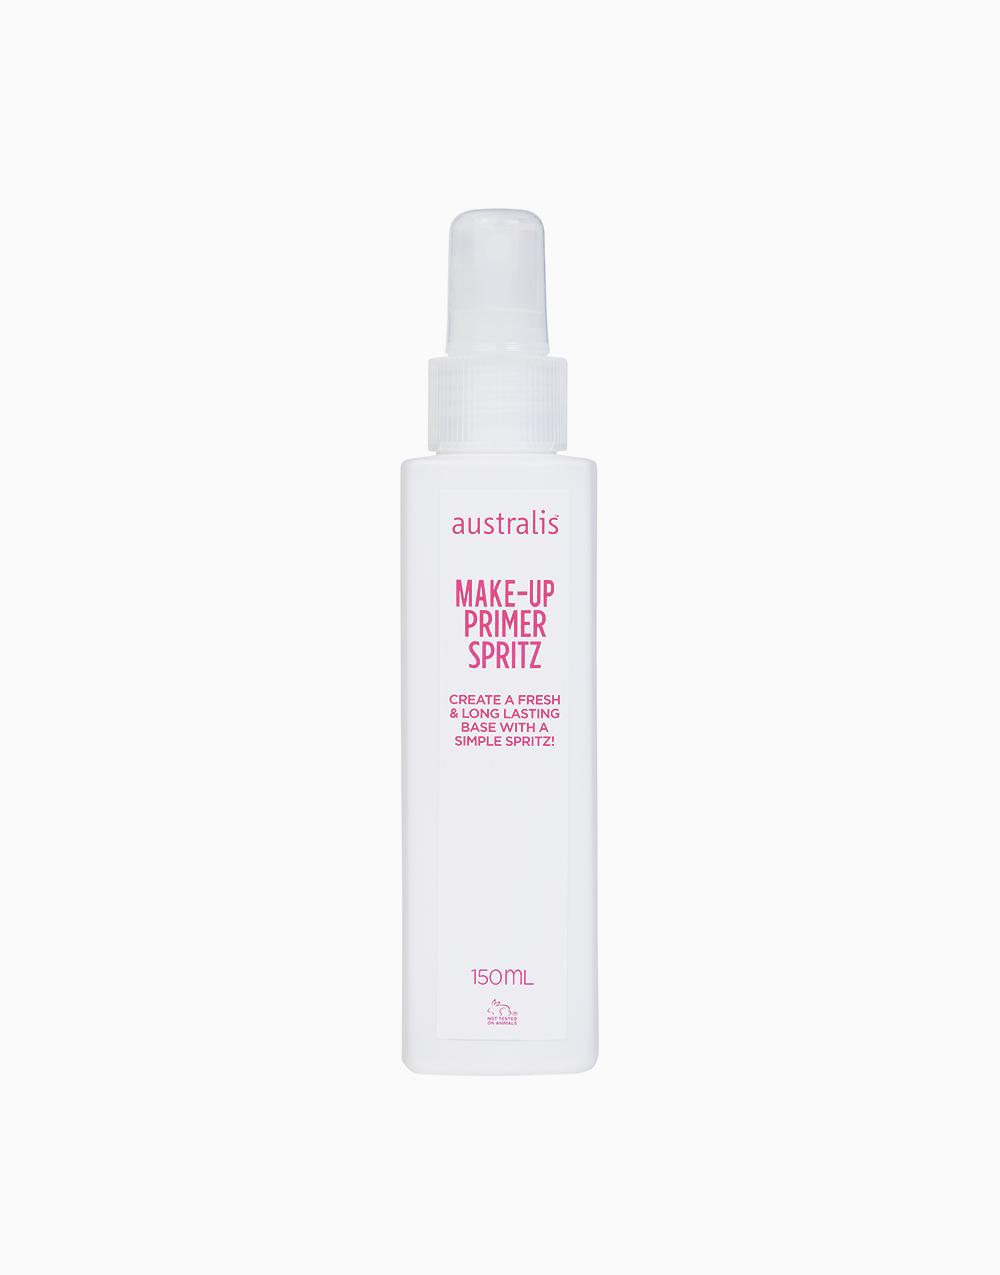 Make-up Primer Spritz by Australis